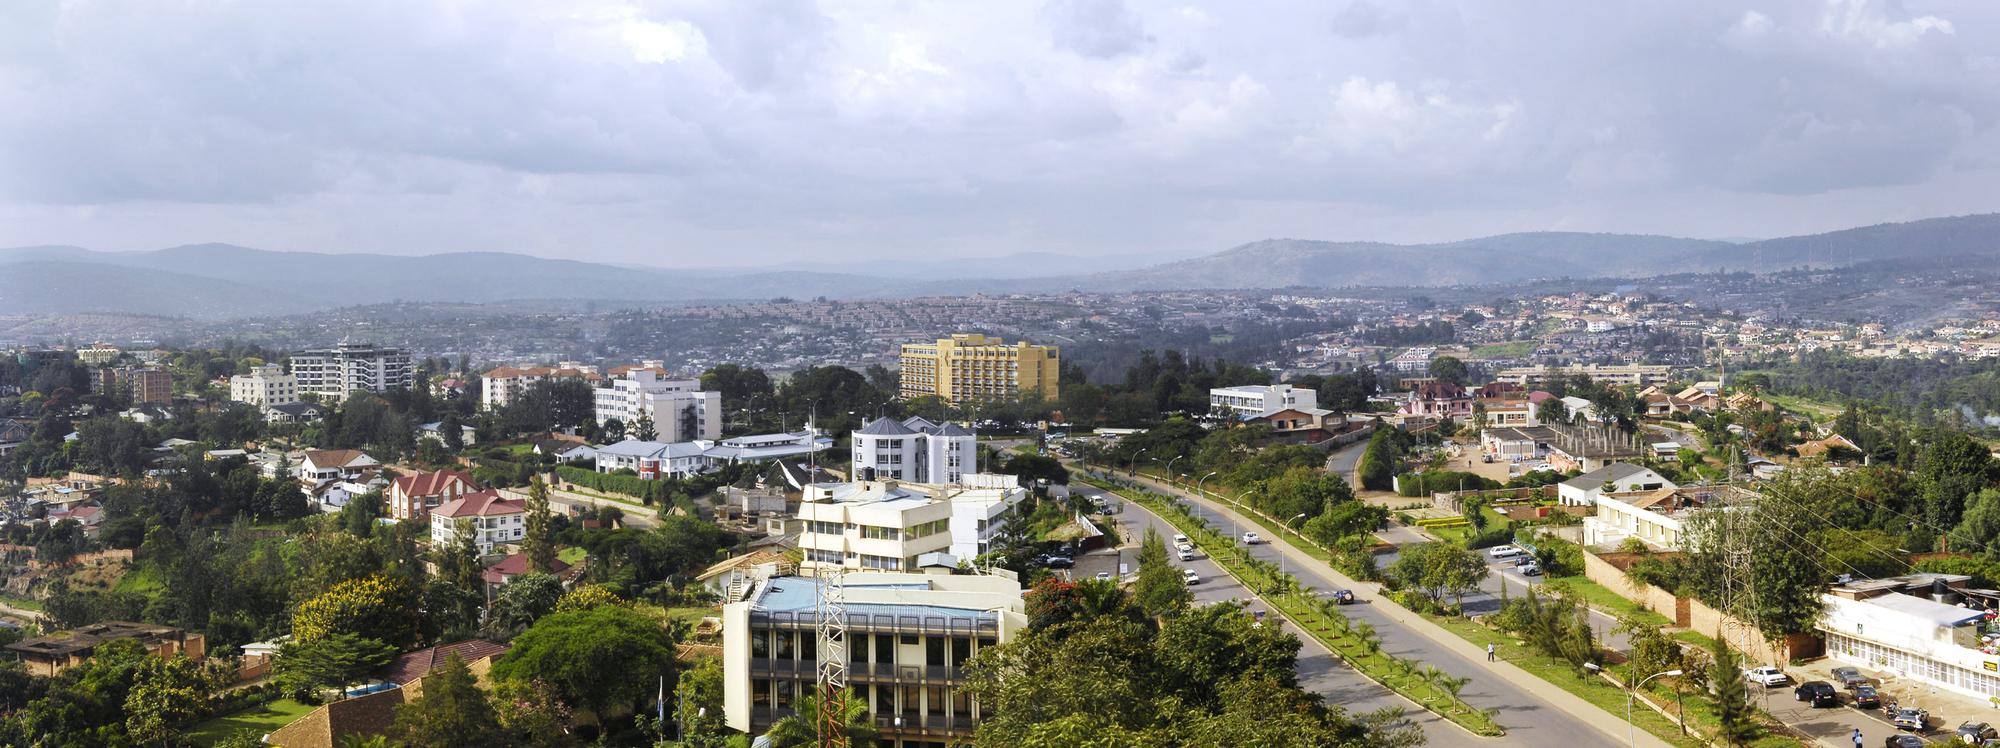 Kigali, au Rwanda (photo d'illustration).